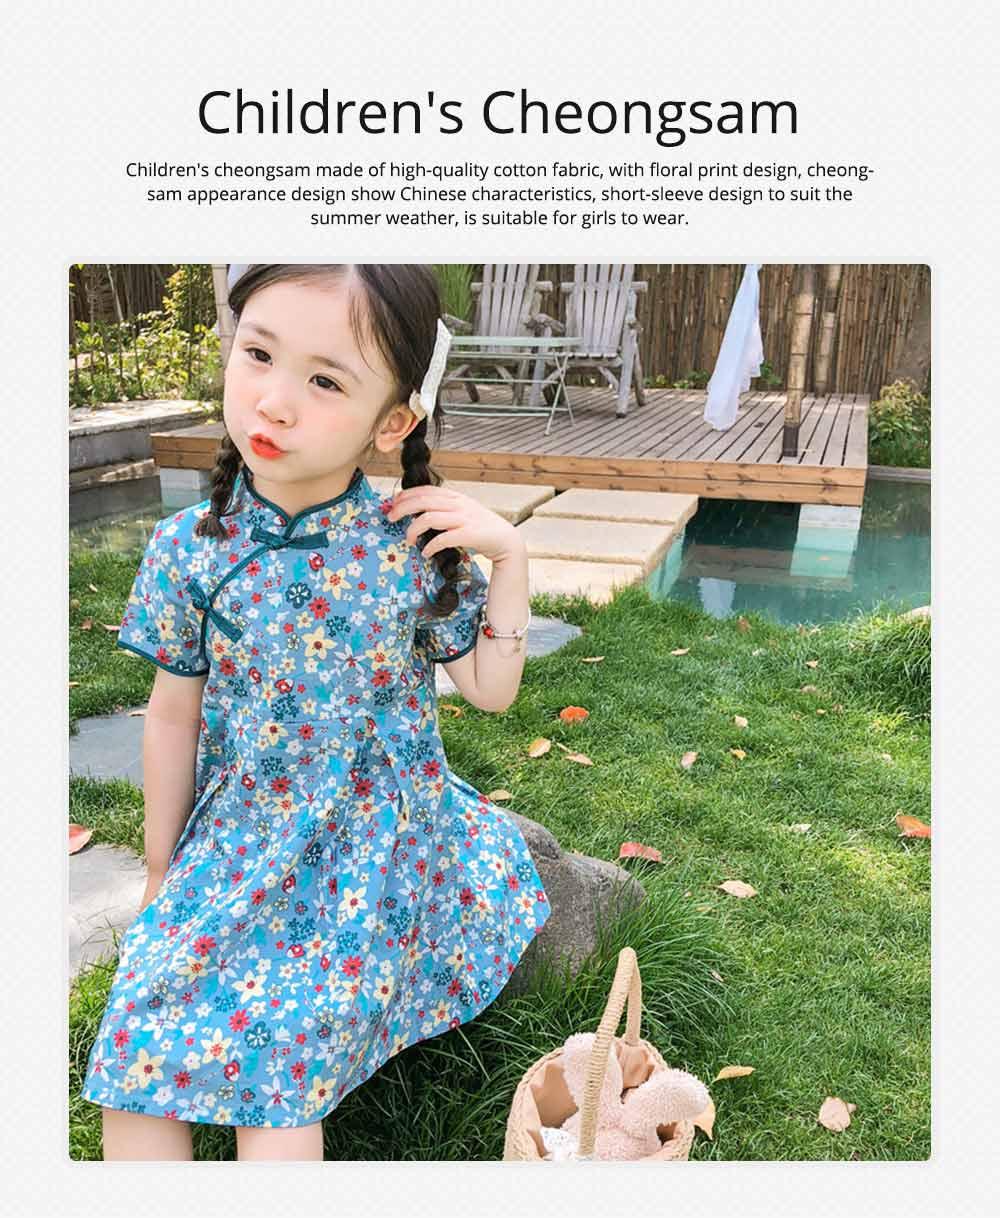 Girls Cheongsam Floral Print Retro Style Short-sleeve Skin-friendly Breathable One-piece Dress Summer 0